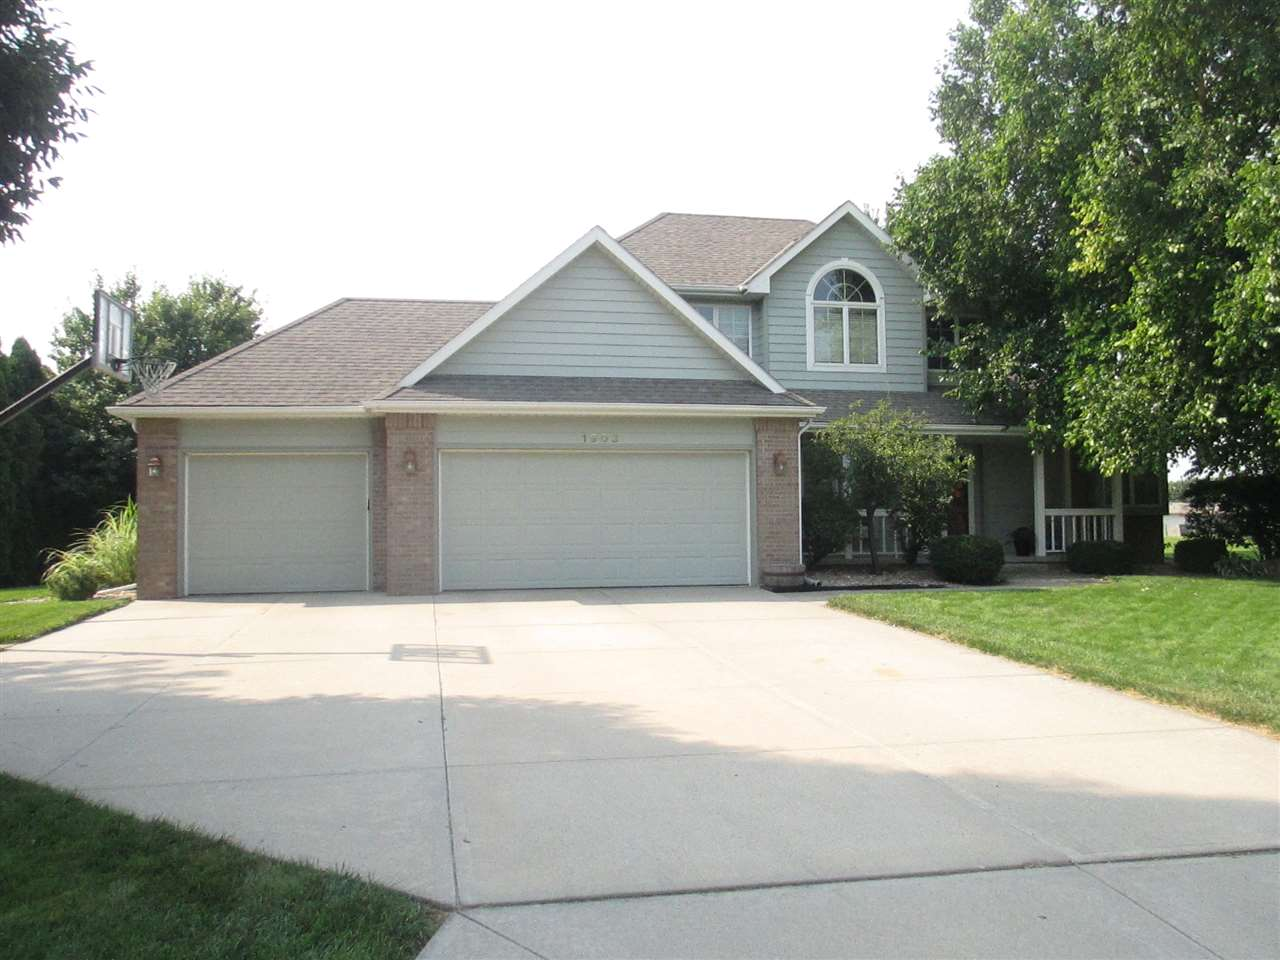 Real Estate for Sale, ListingId: 35035589, Hastings,NE68901